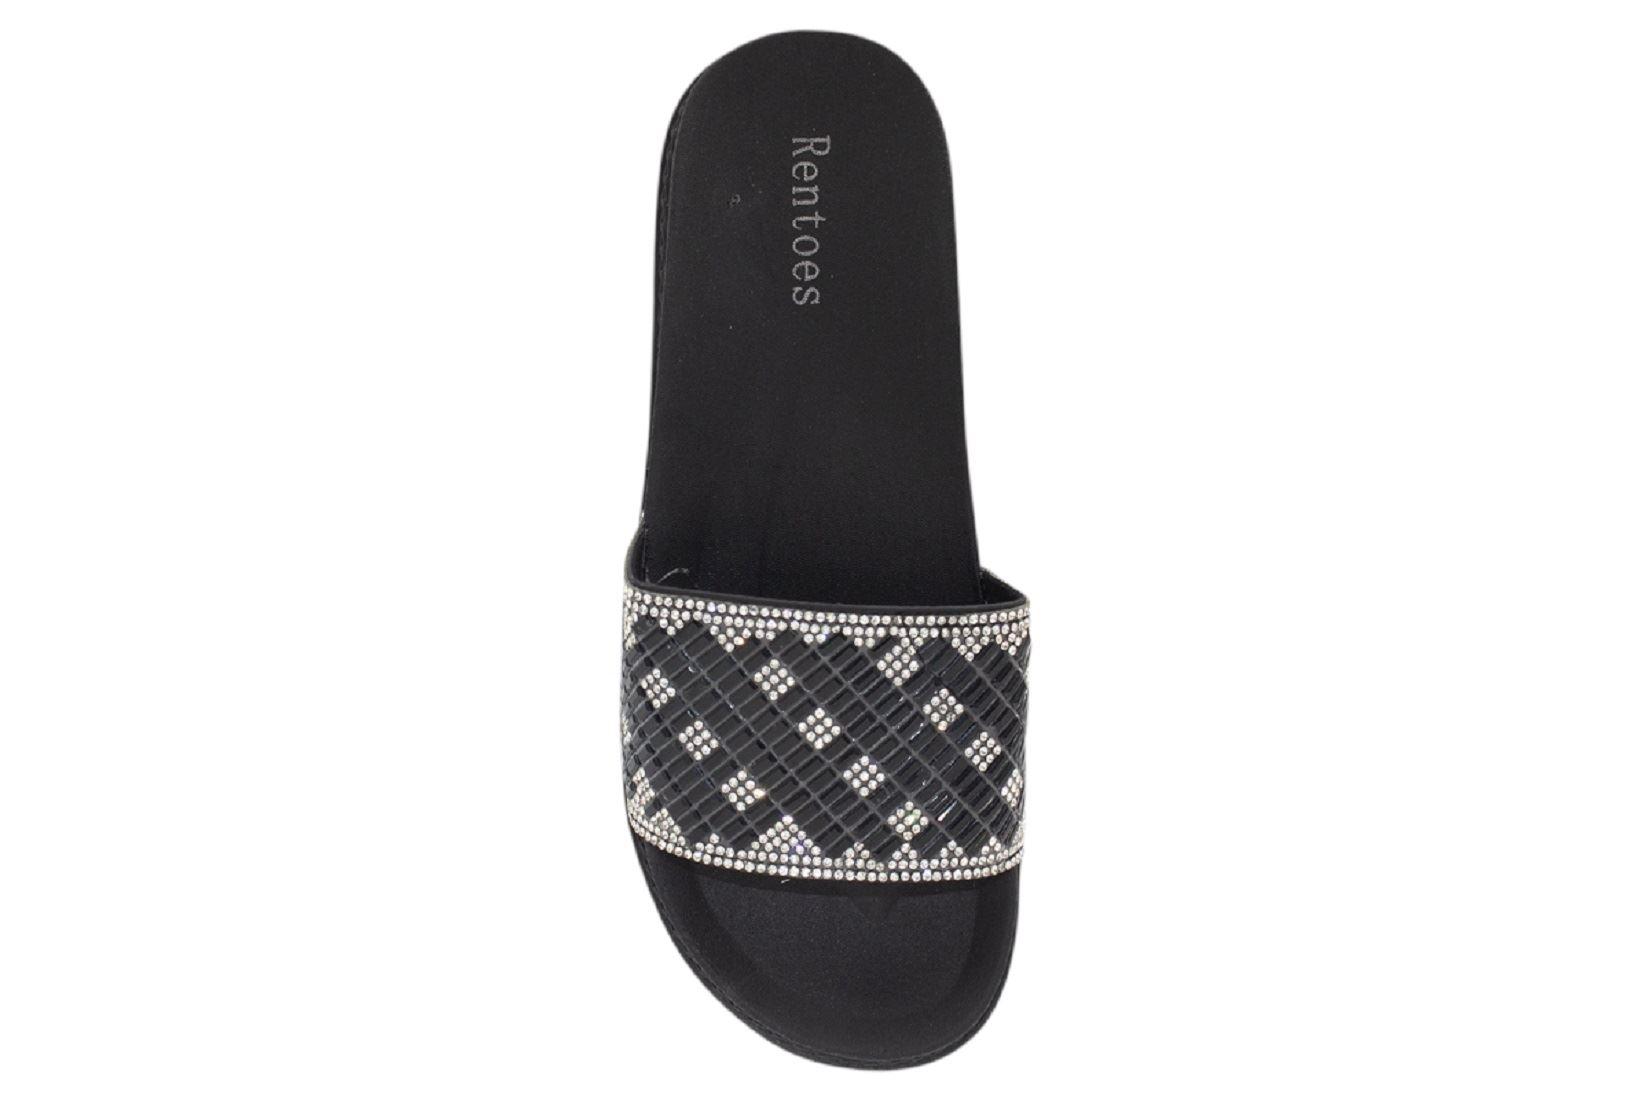 Womens-Sliders-Casual-Slippers-Mules-Ladies-Diamante-Flip-Flop-Sandals-Shoes thumbnail 75